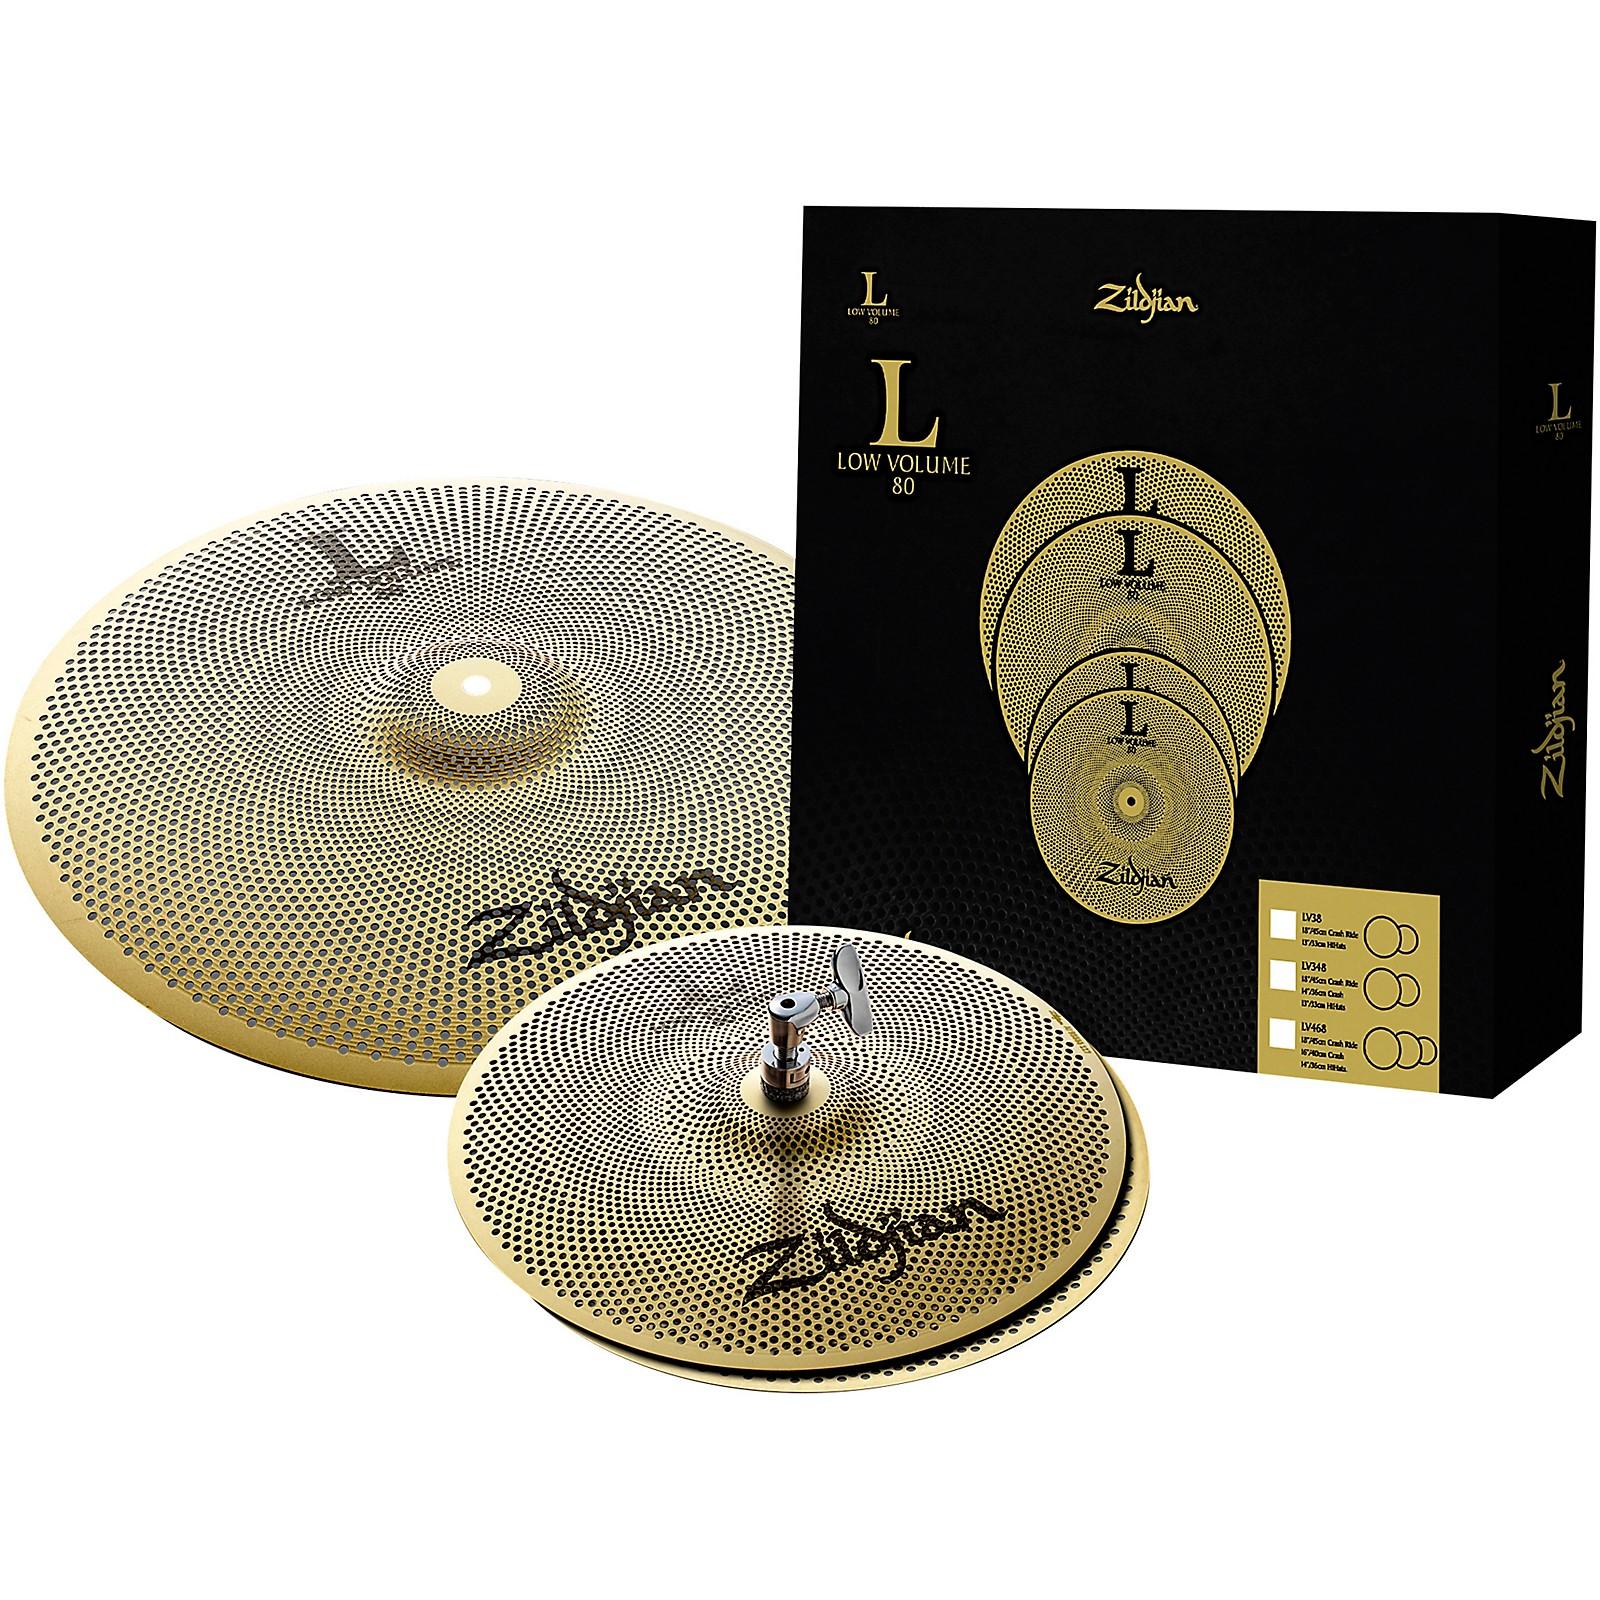 Zildjian L80 Series LV38 Low Volume Cymbal Box Set